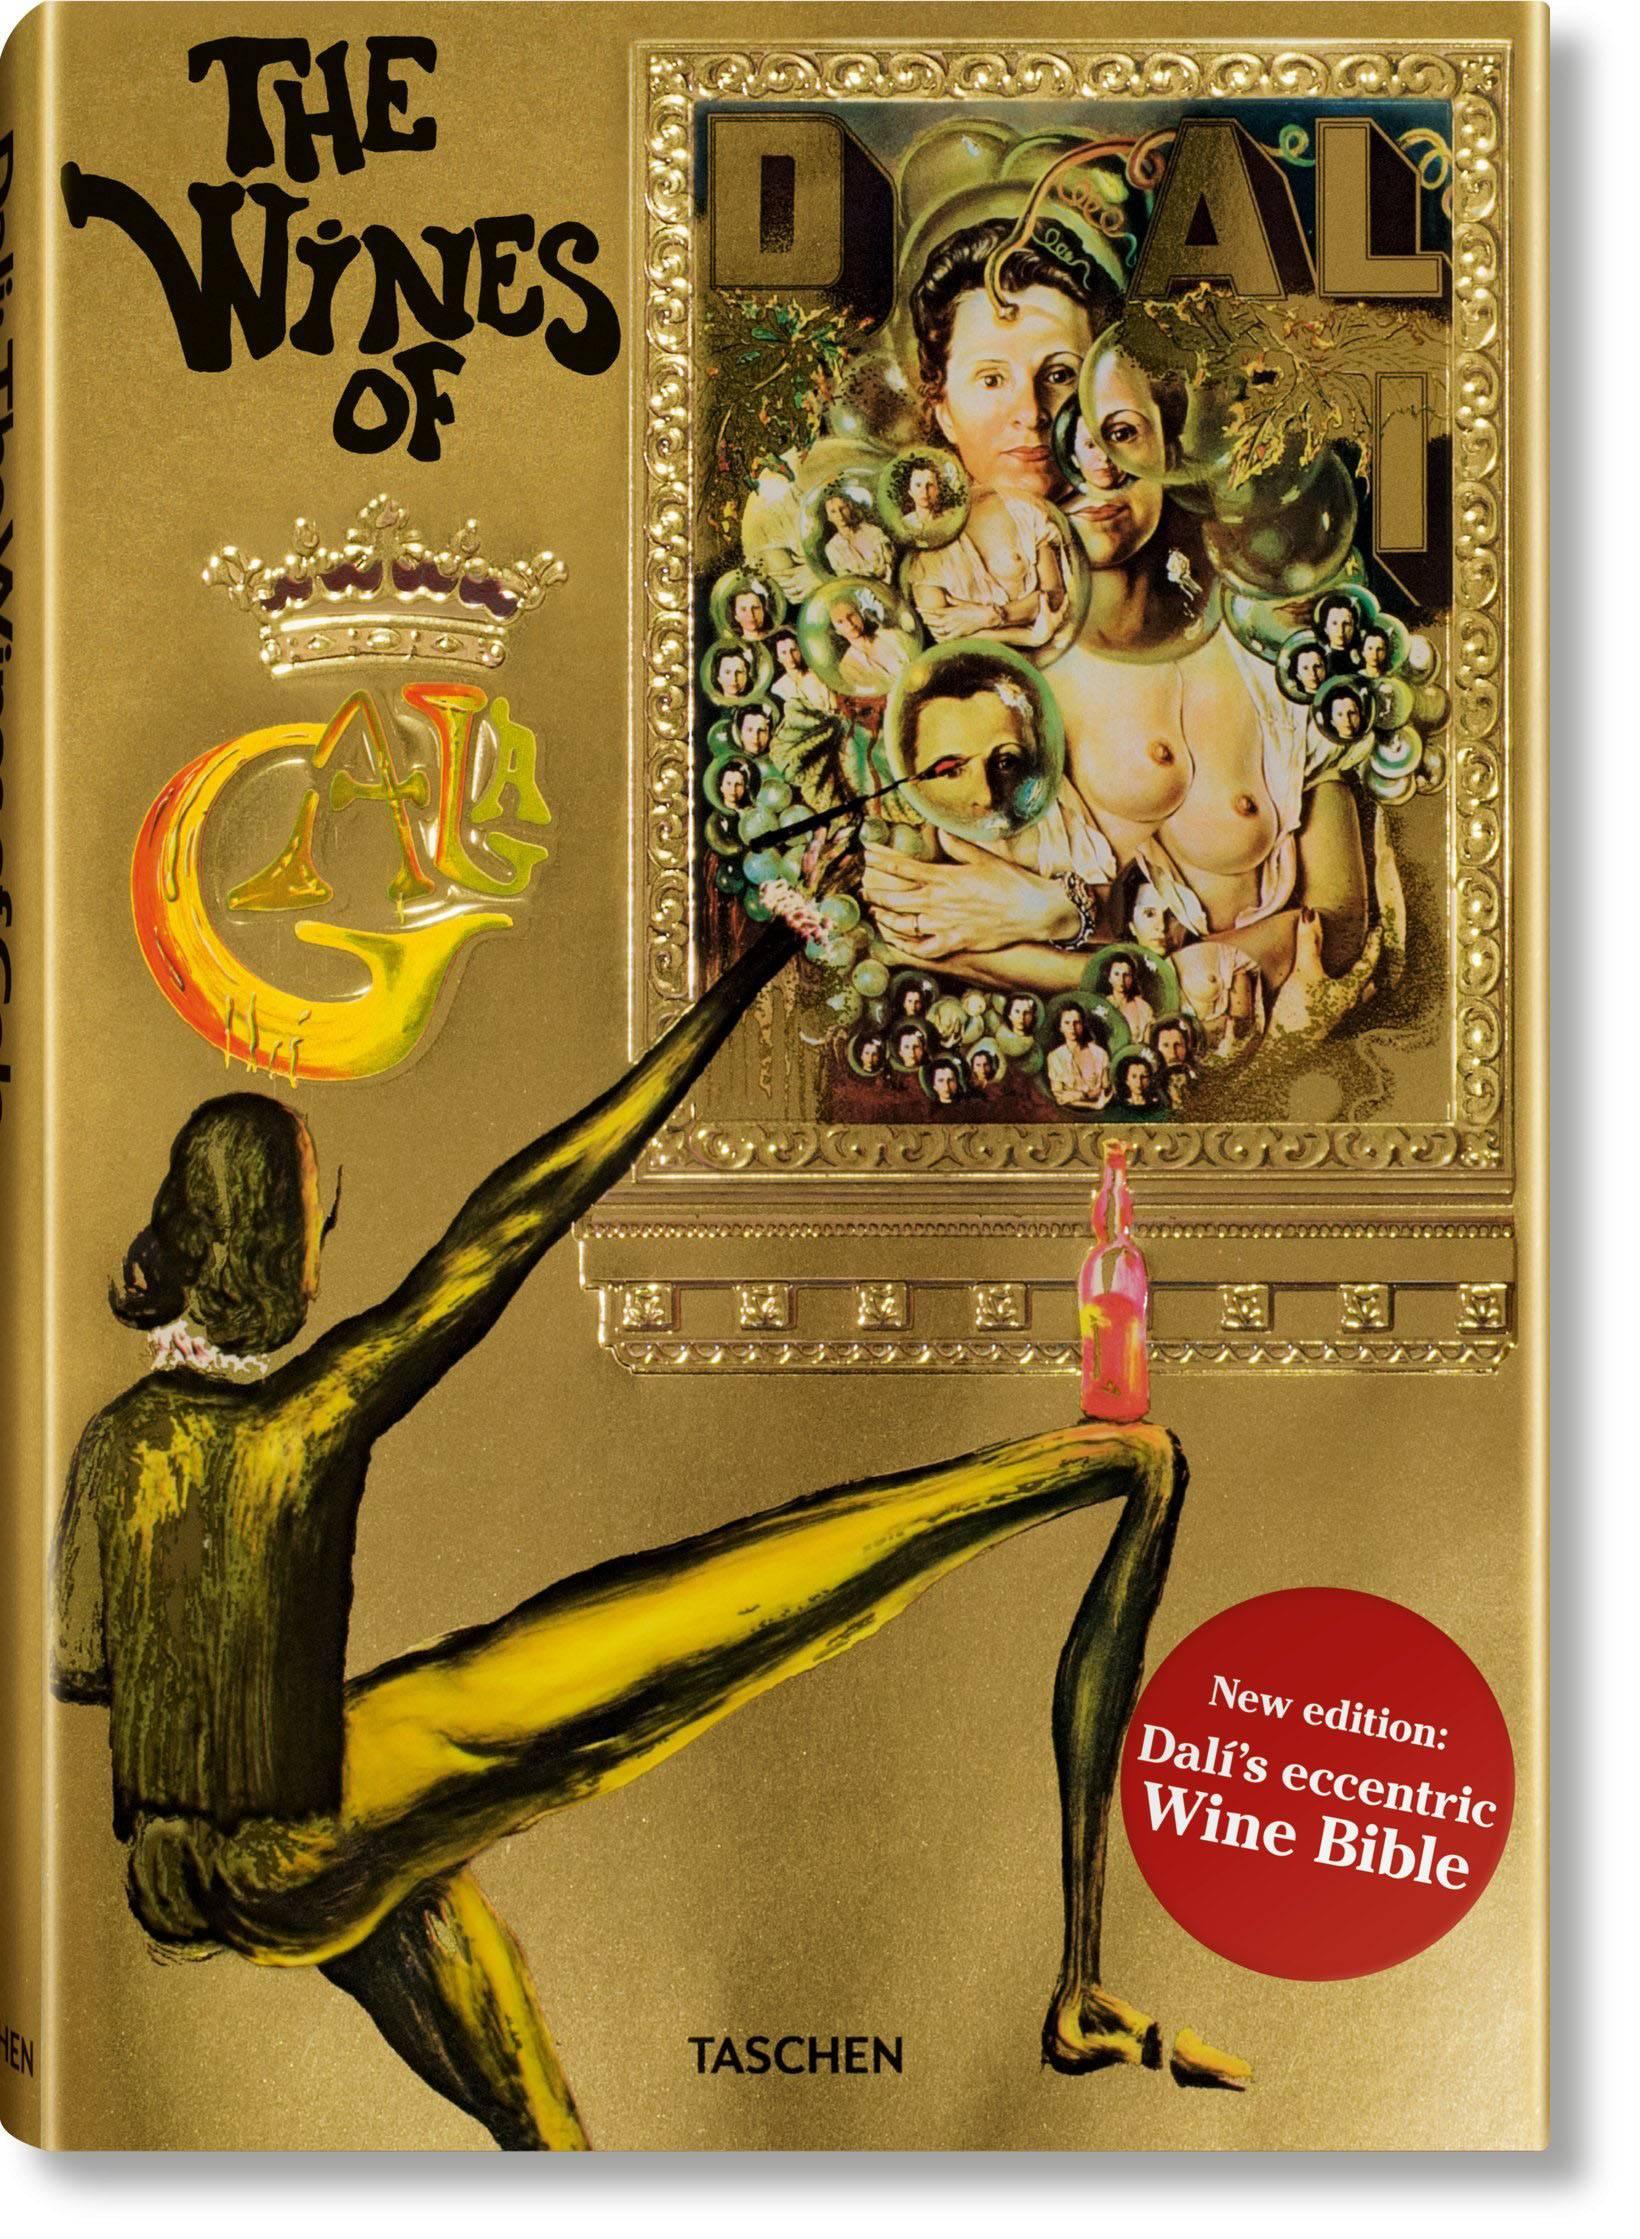 The Wines of Galas explores wine classification through Salvador ...